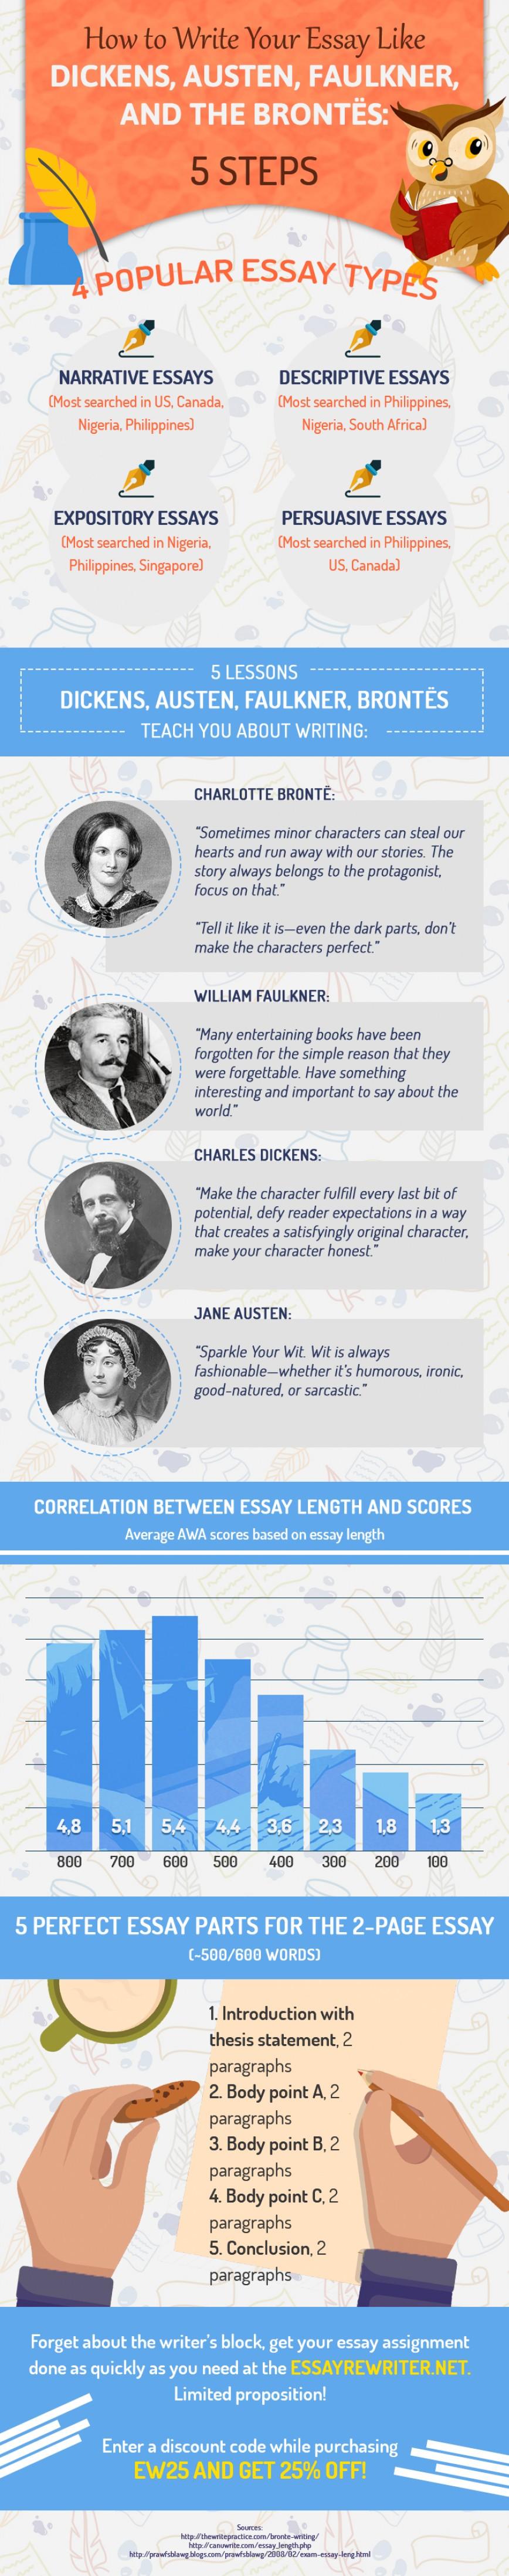 021 Essay Rewriter Example Writing Singular Free Software Crack Generator 868